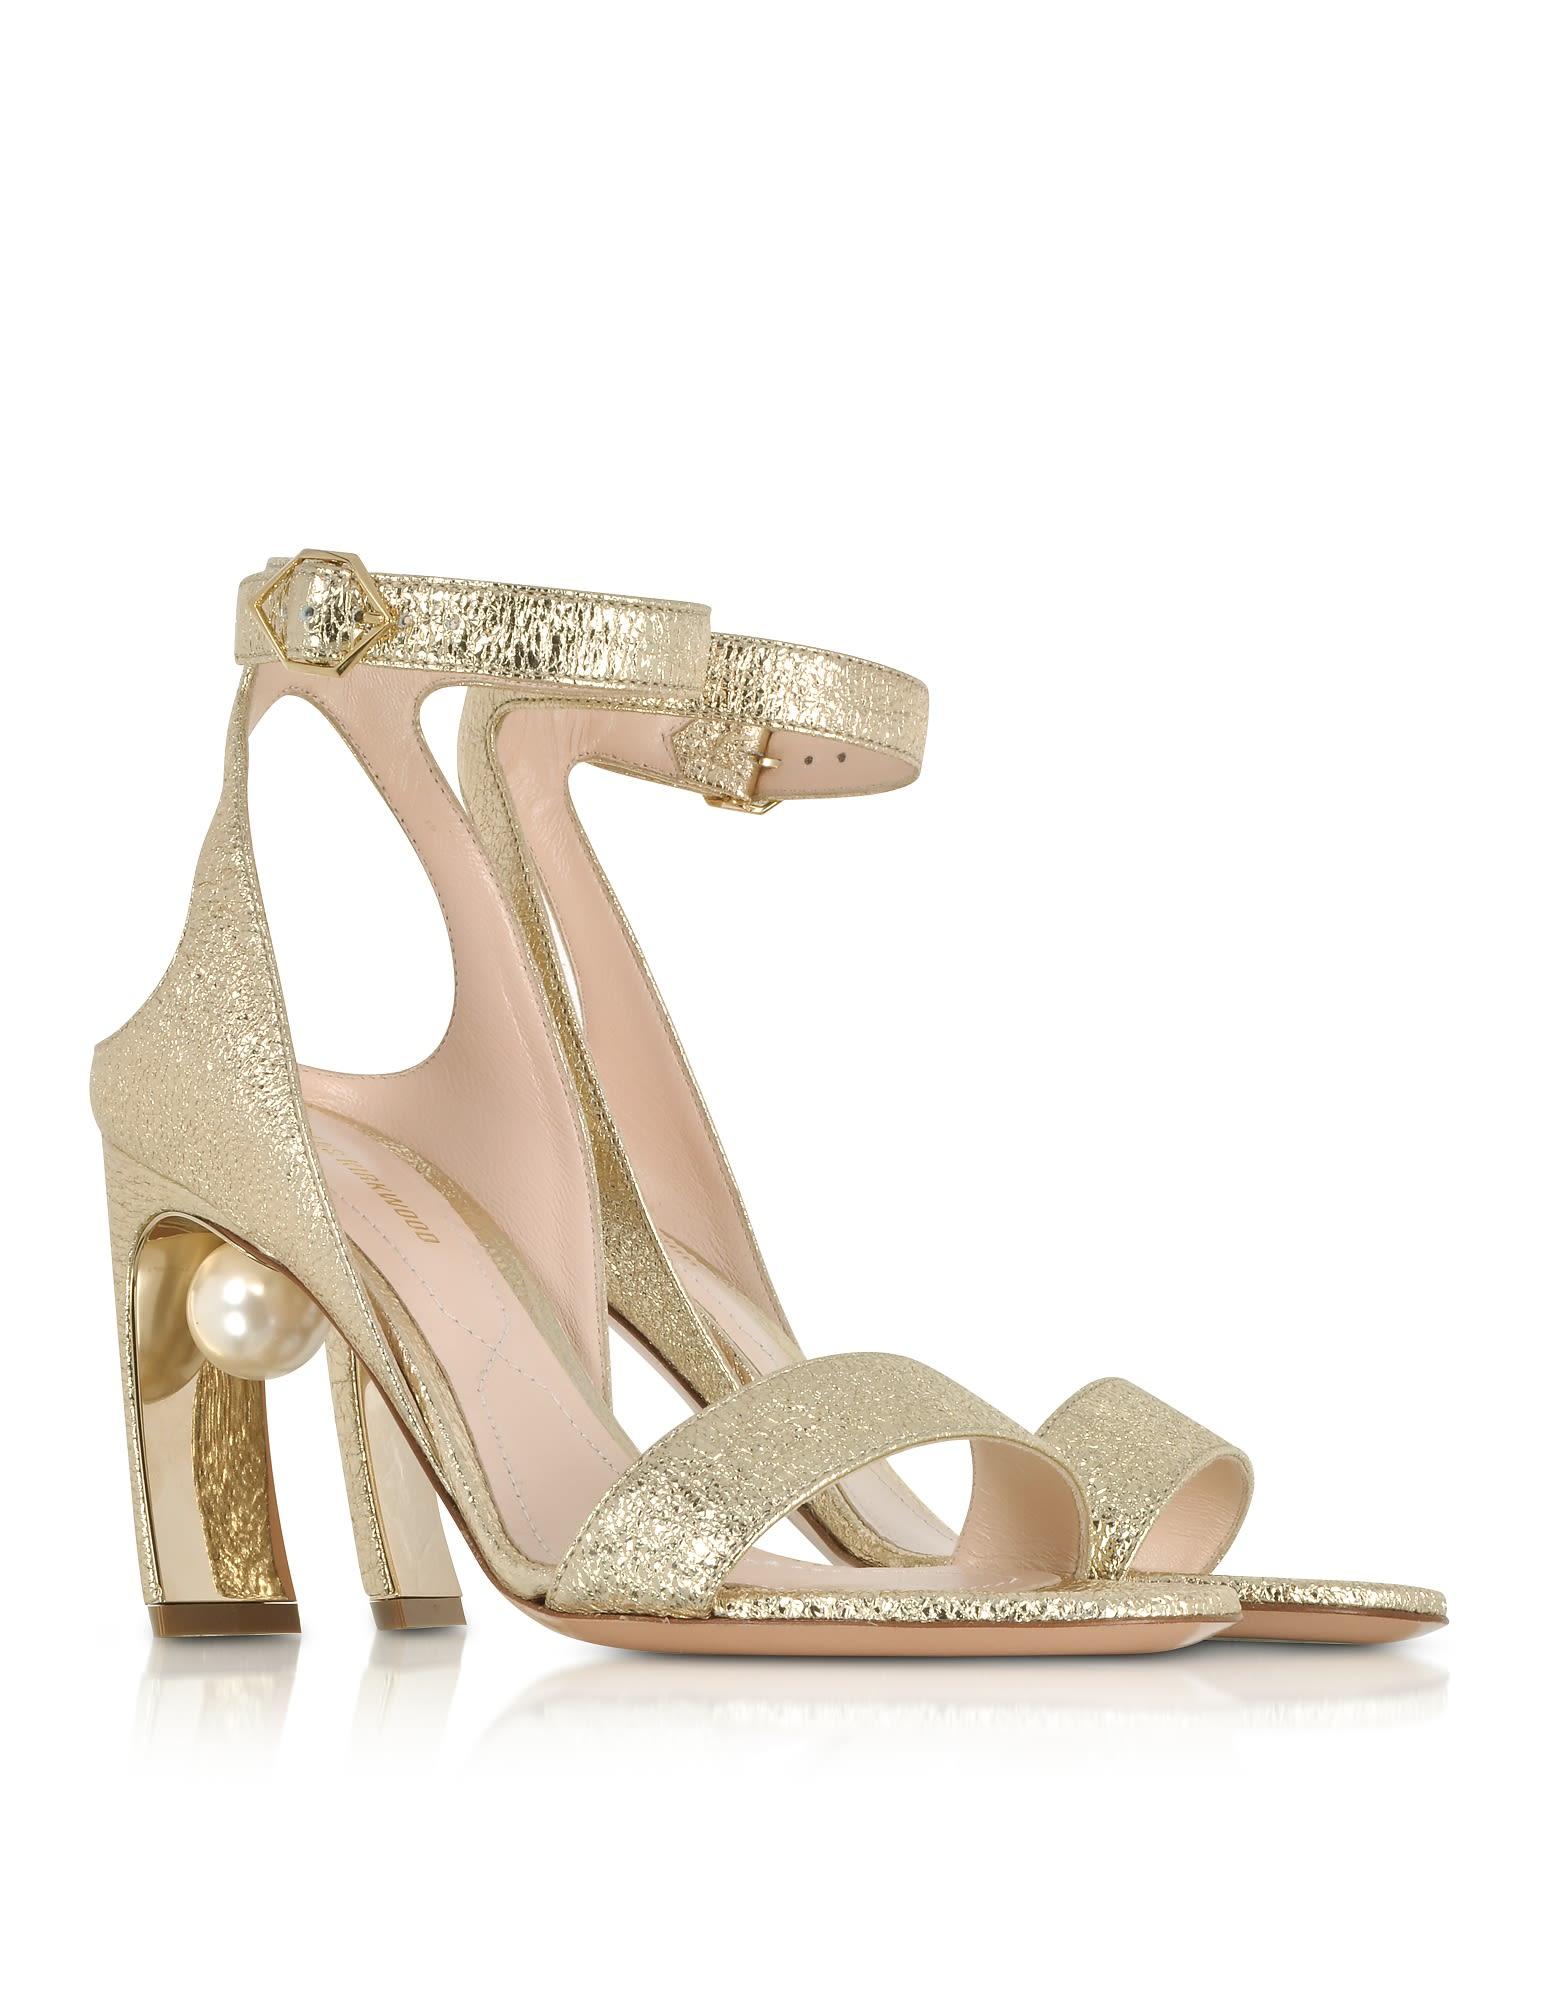 Nicholas Kirkwood Designer Shoes, Crinkly Metallic Leather 90mm Lola Pearl Sandals